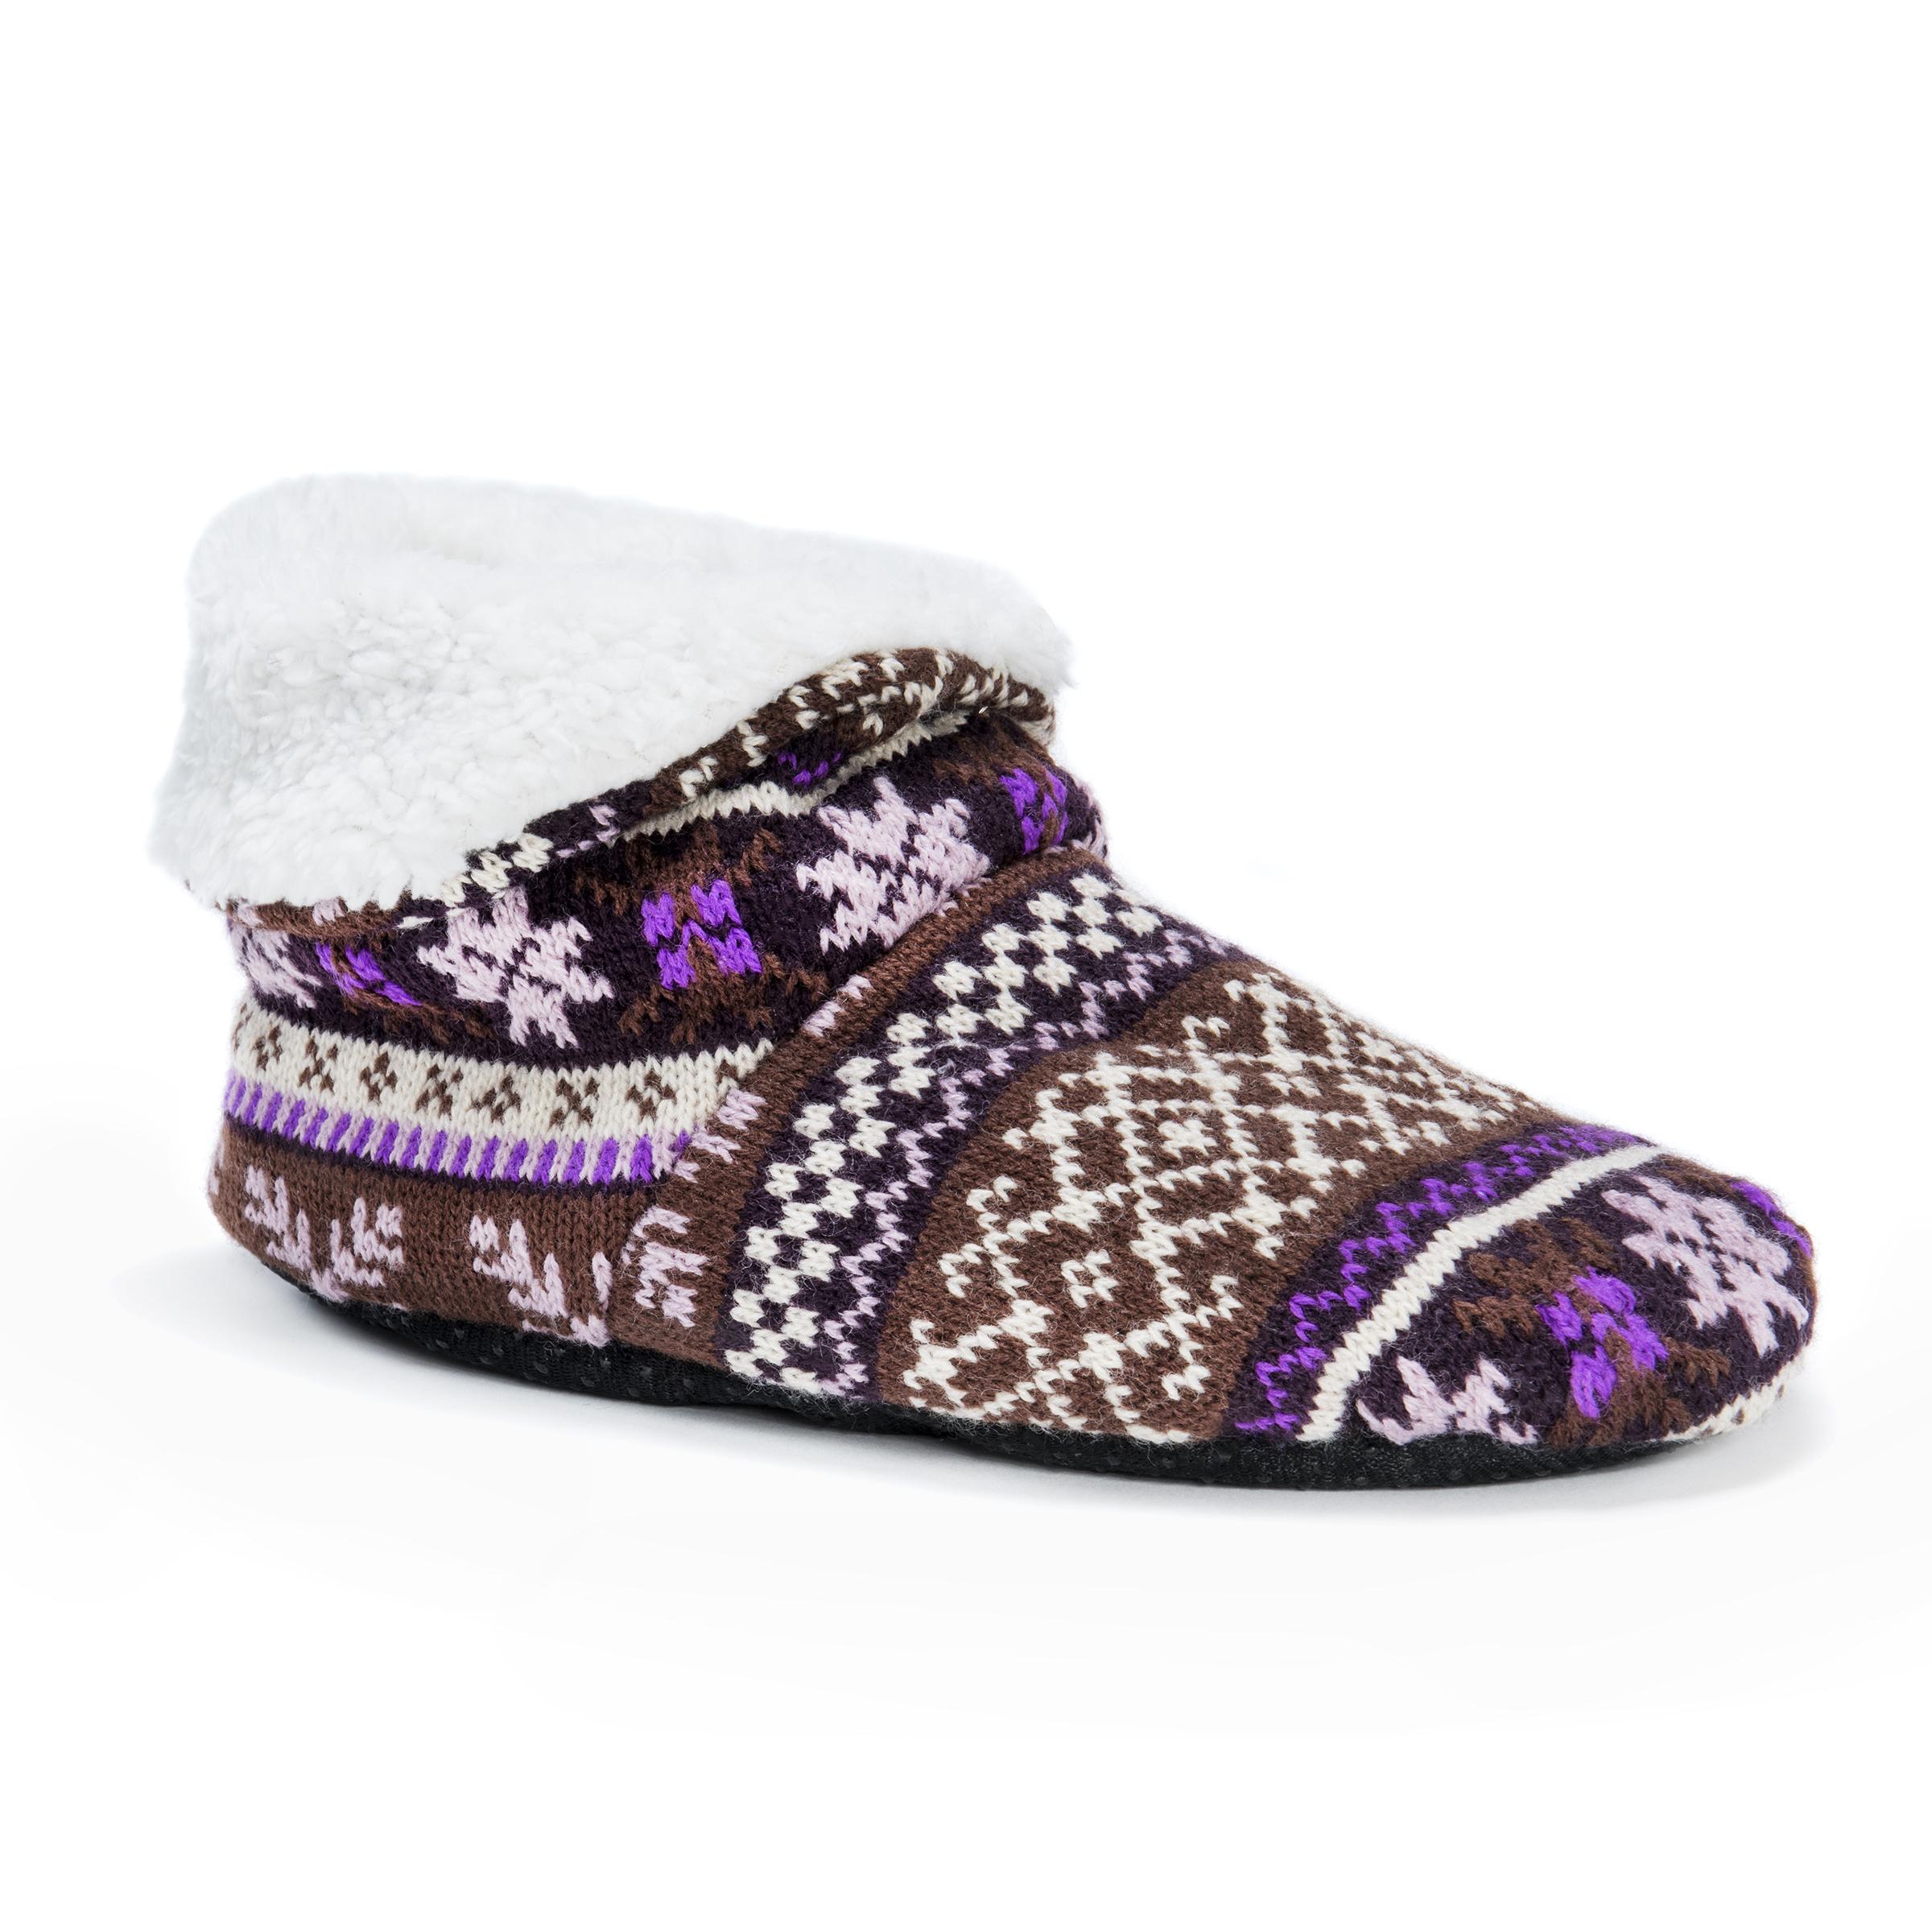 MUK LUKS® Women's Bootie Slippers – Plum | Slippers.com